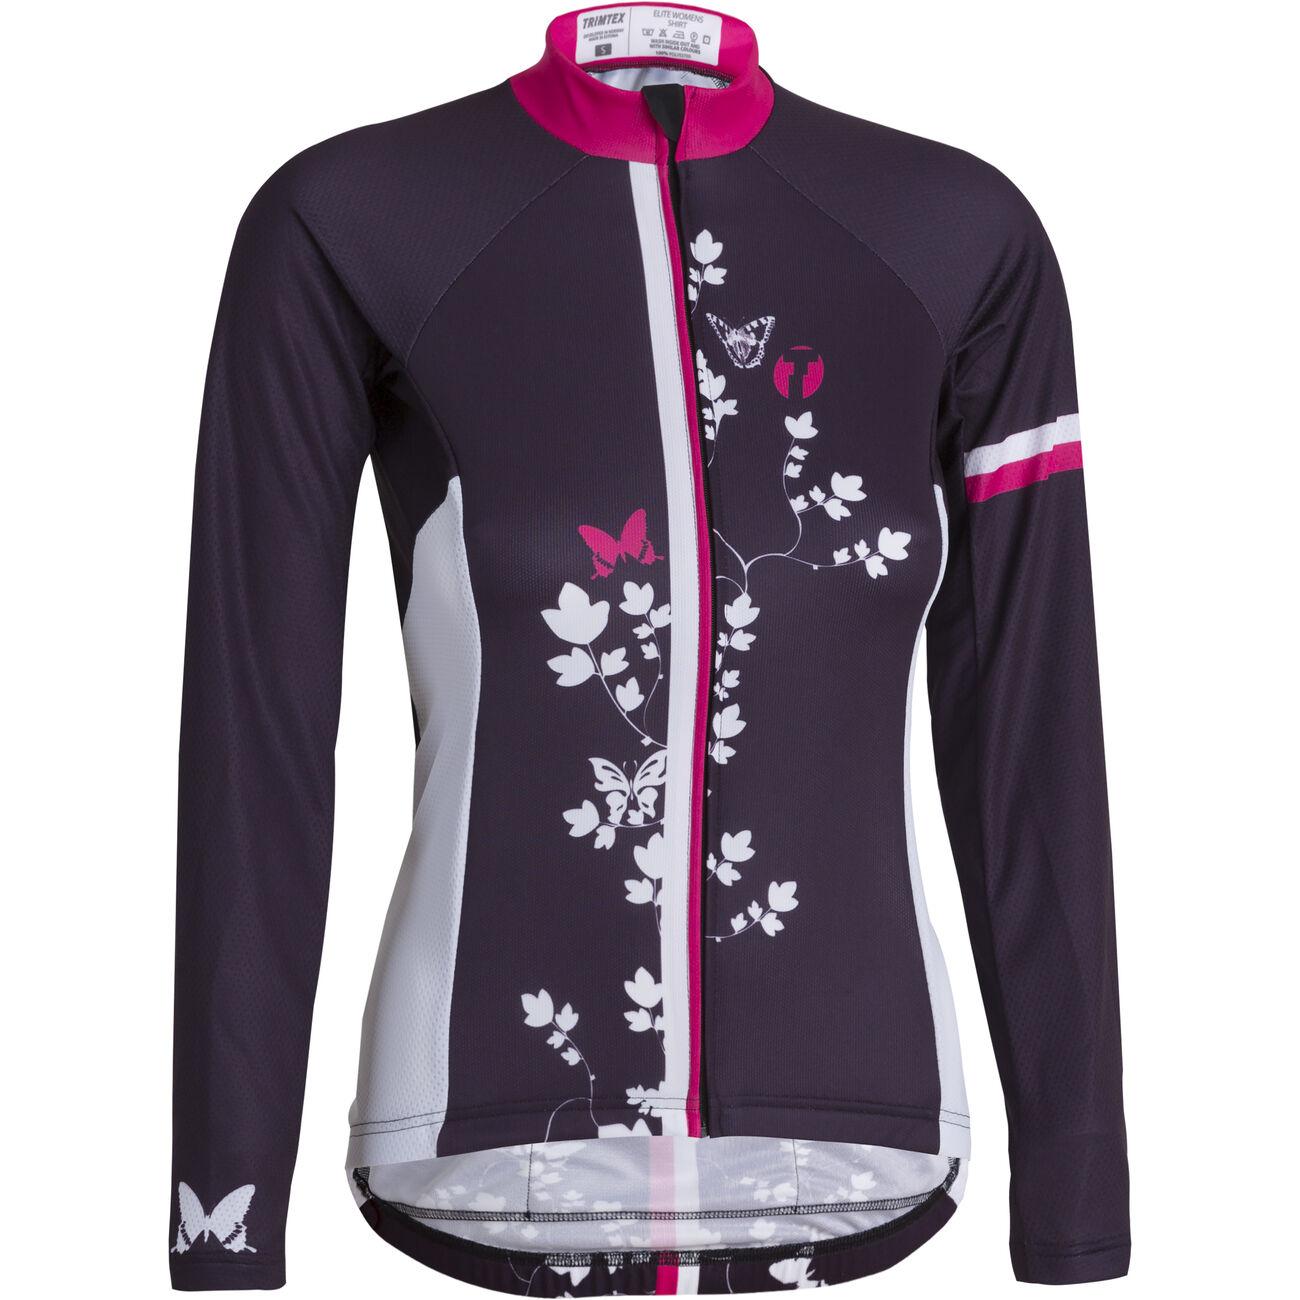 Elite cycling jersey women's